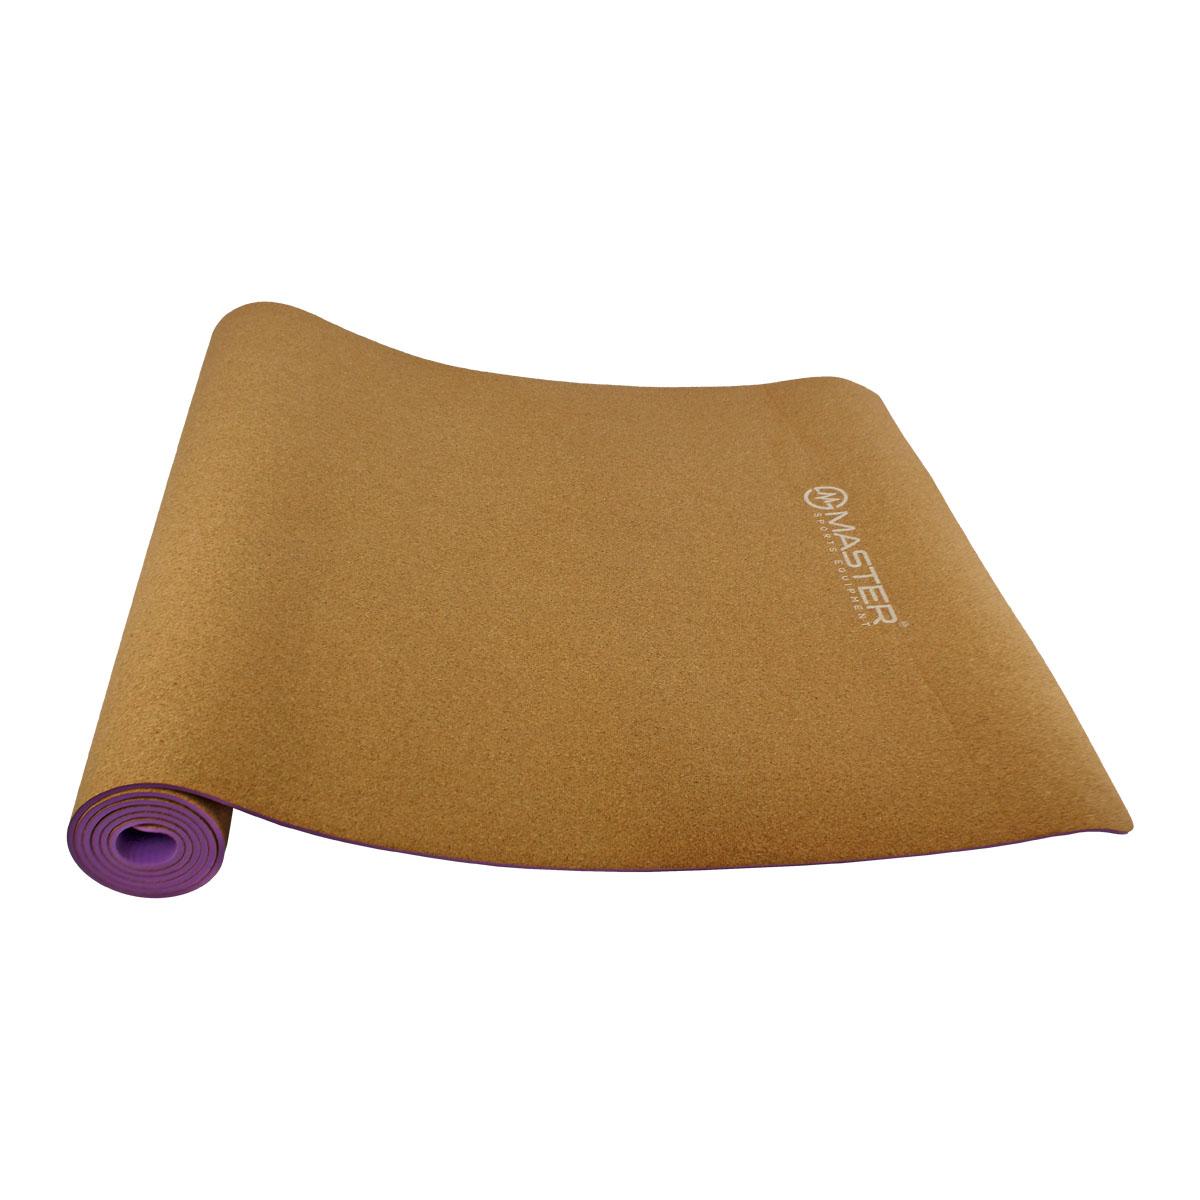 Podložka na cvičenie MASTER Yoga 4 mm - 183 x 61 cm - korková - fialová